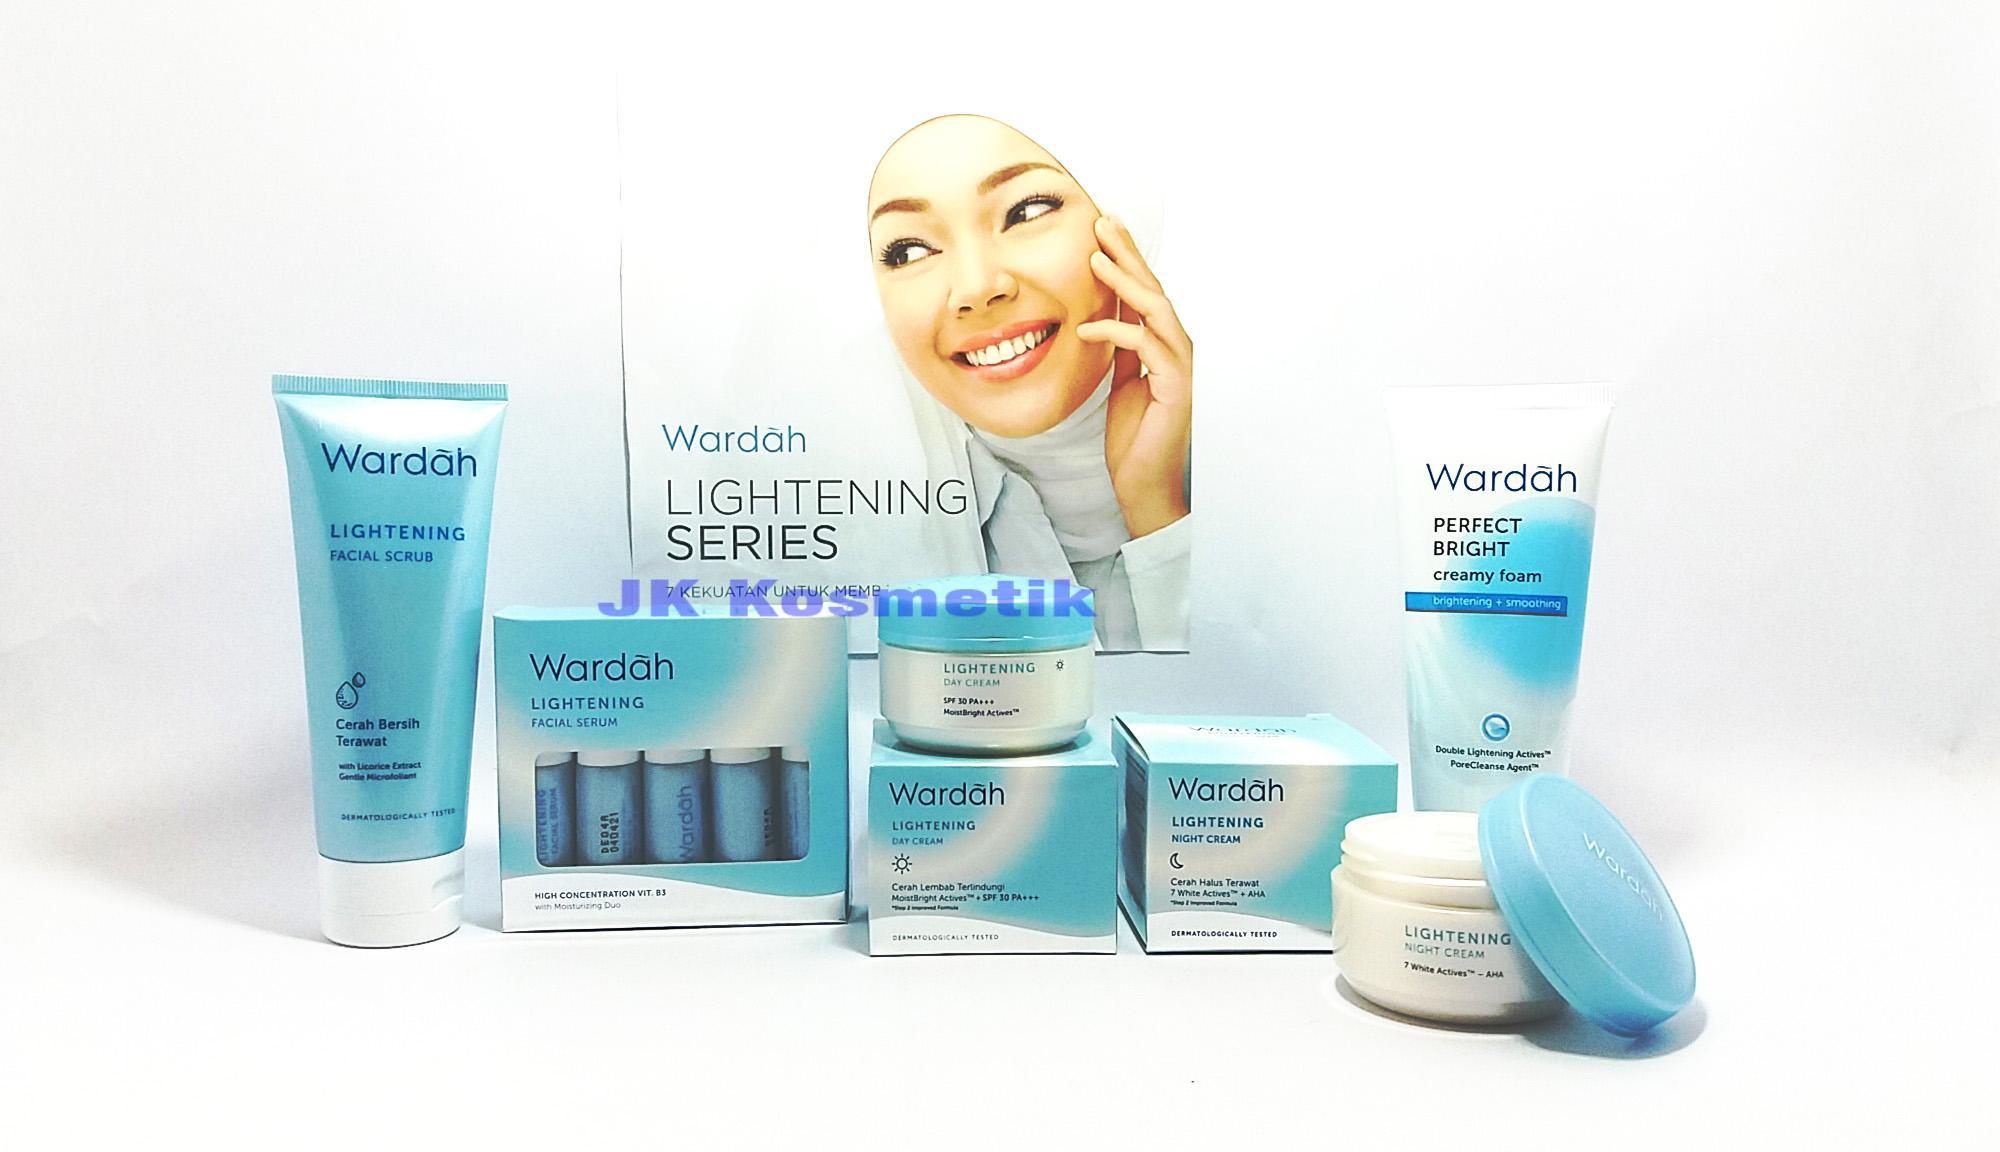 Wardah Cosmetics 1 Essential Facial Scrub 600 Ml Lightening Series New Isi 5 Item